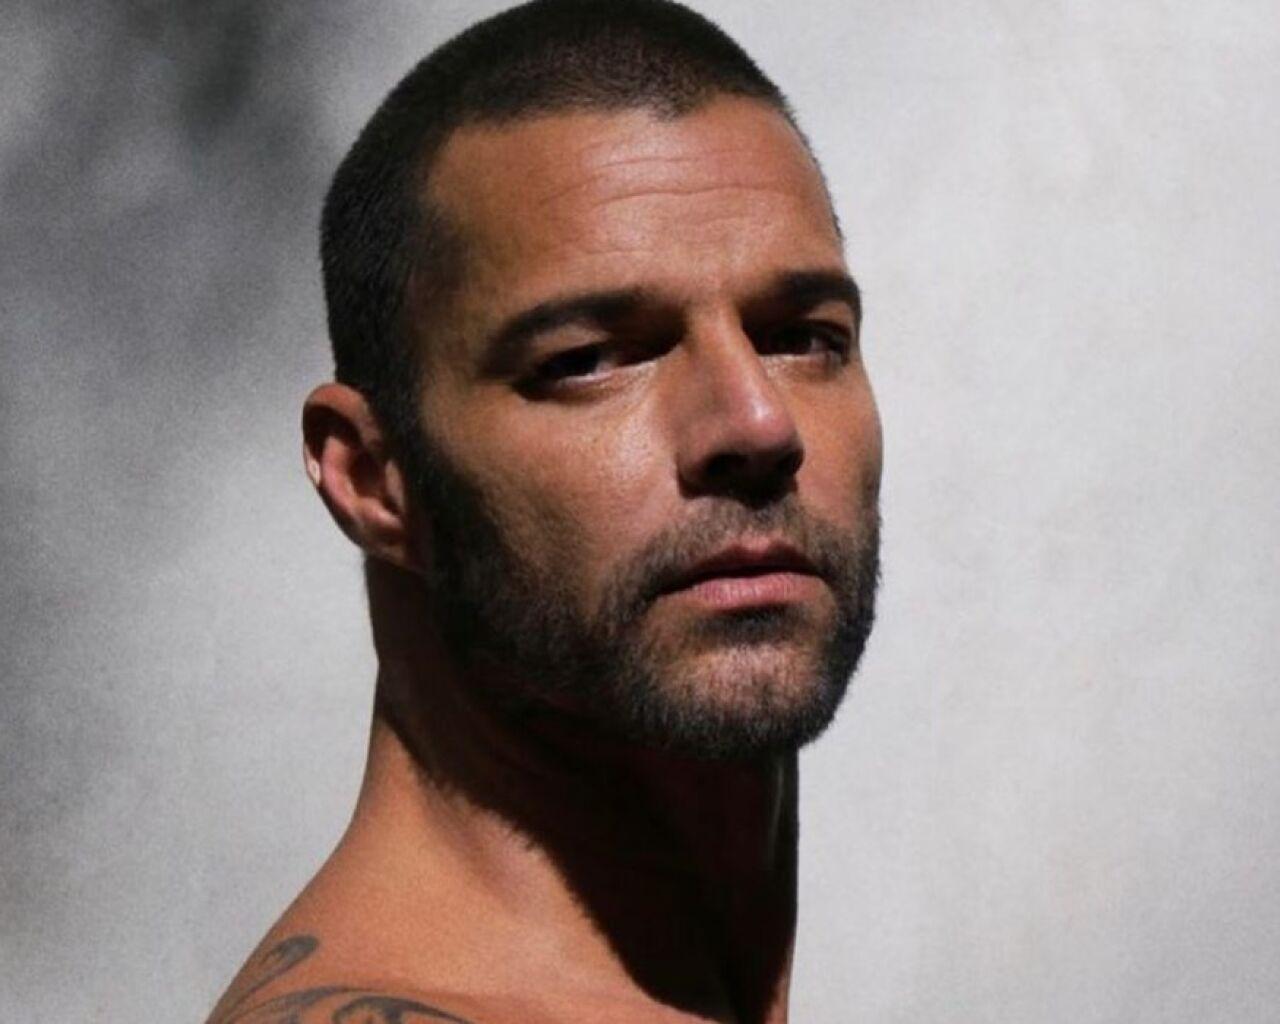 Ricky Martin vacunación Covid-19.jpg